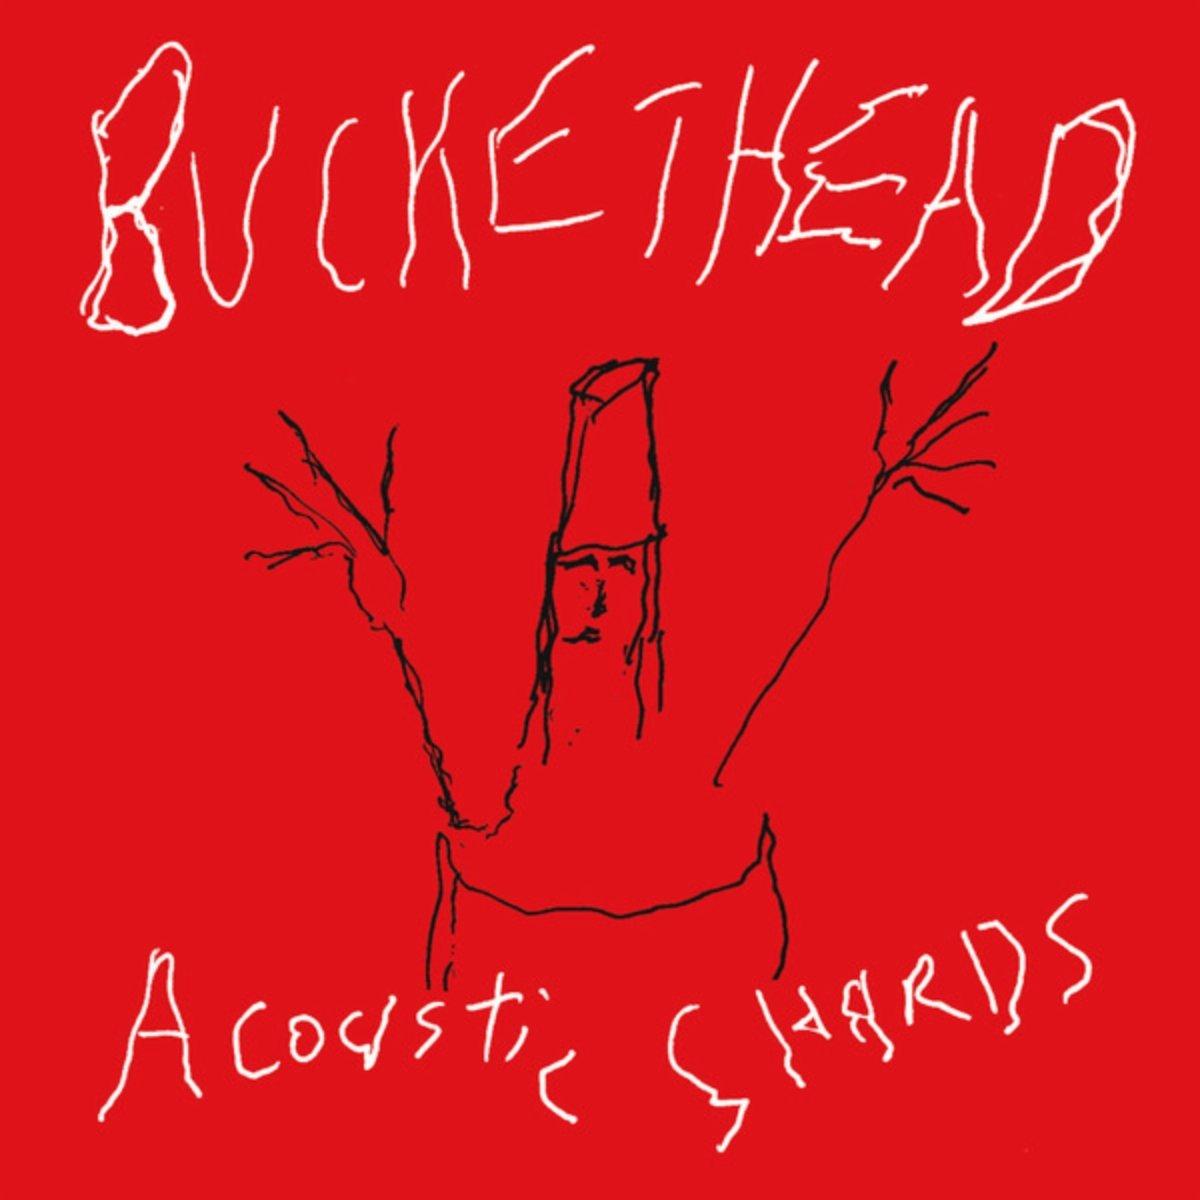 Buckethead – Acoustic Shards (2007) [FLAC]